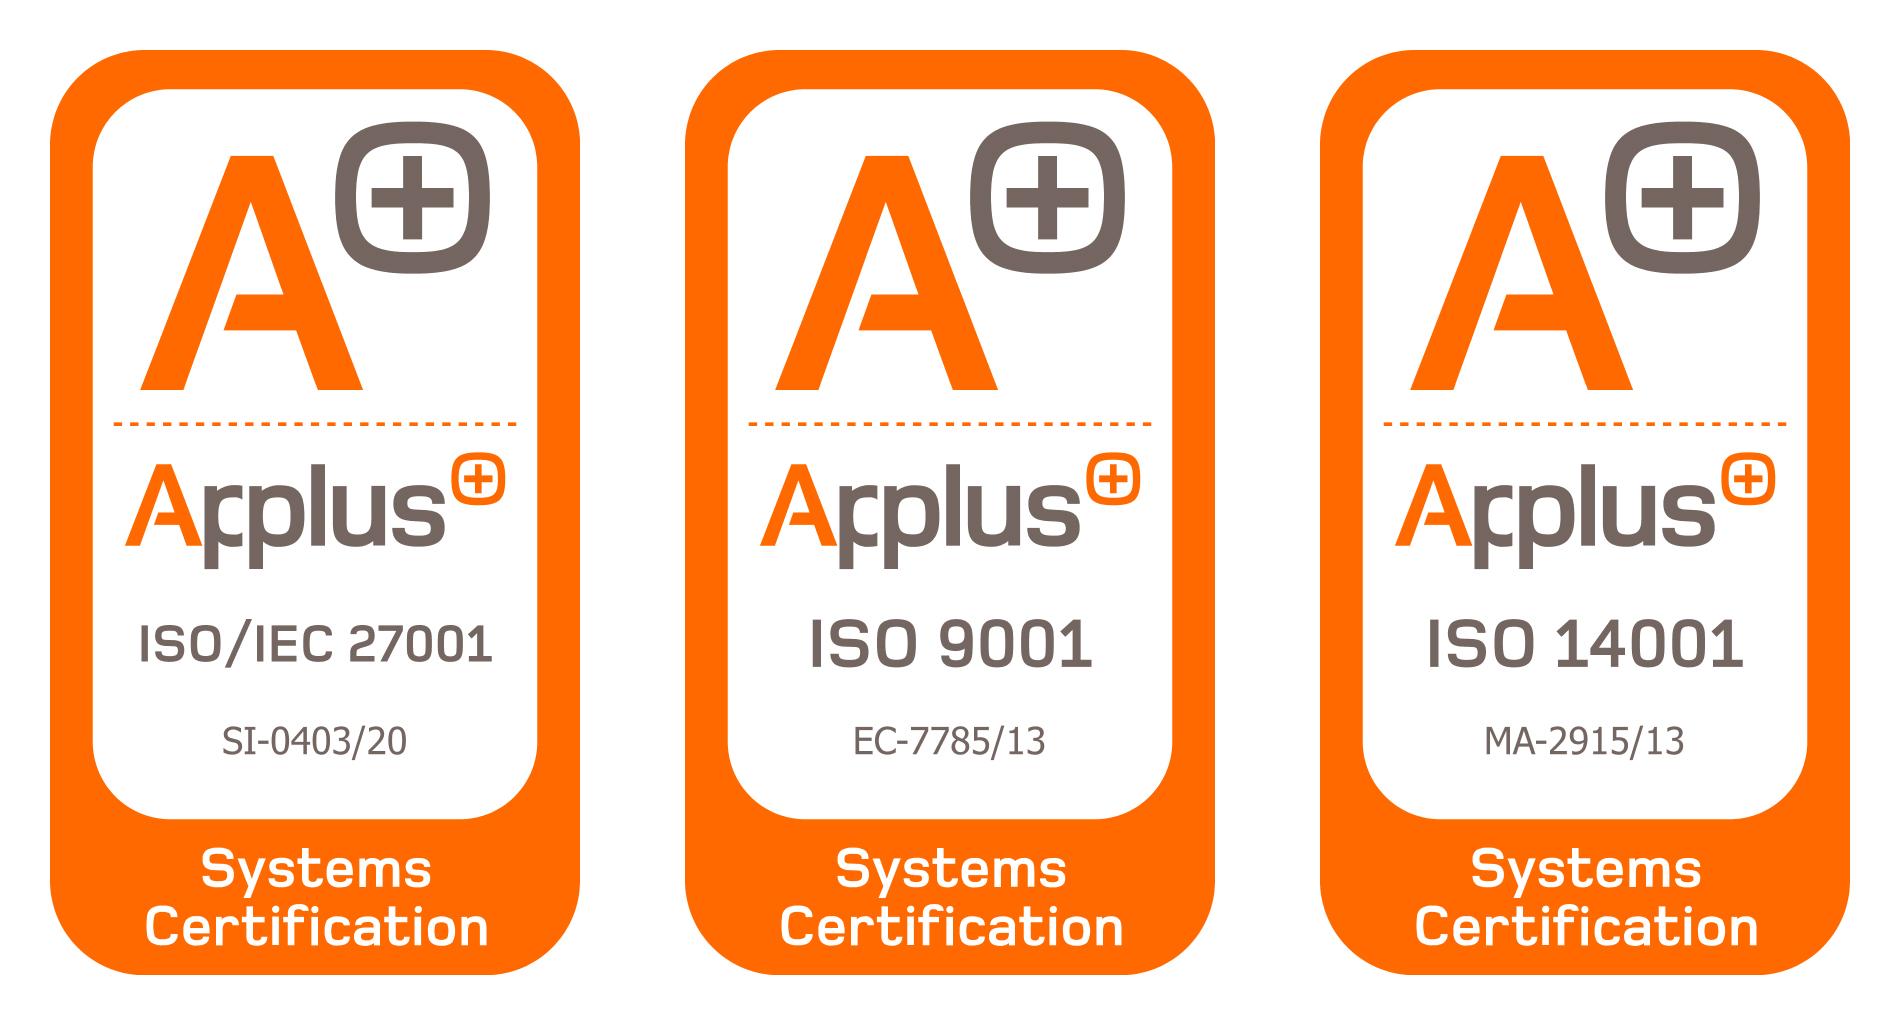 certificaciones-iso